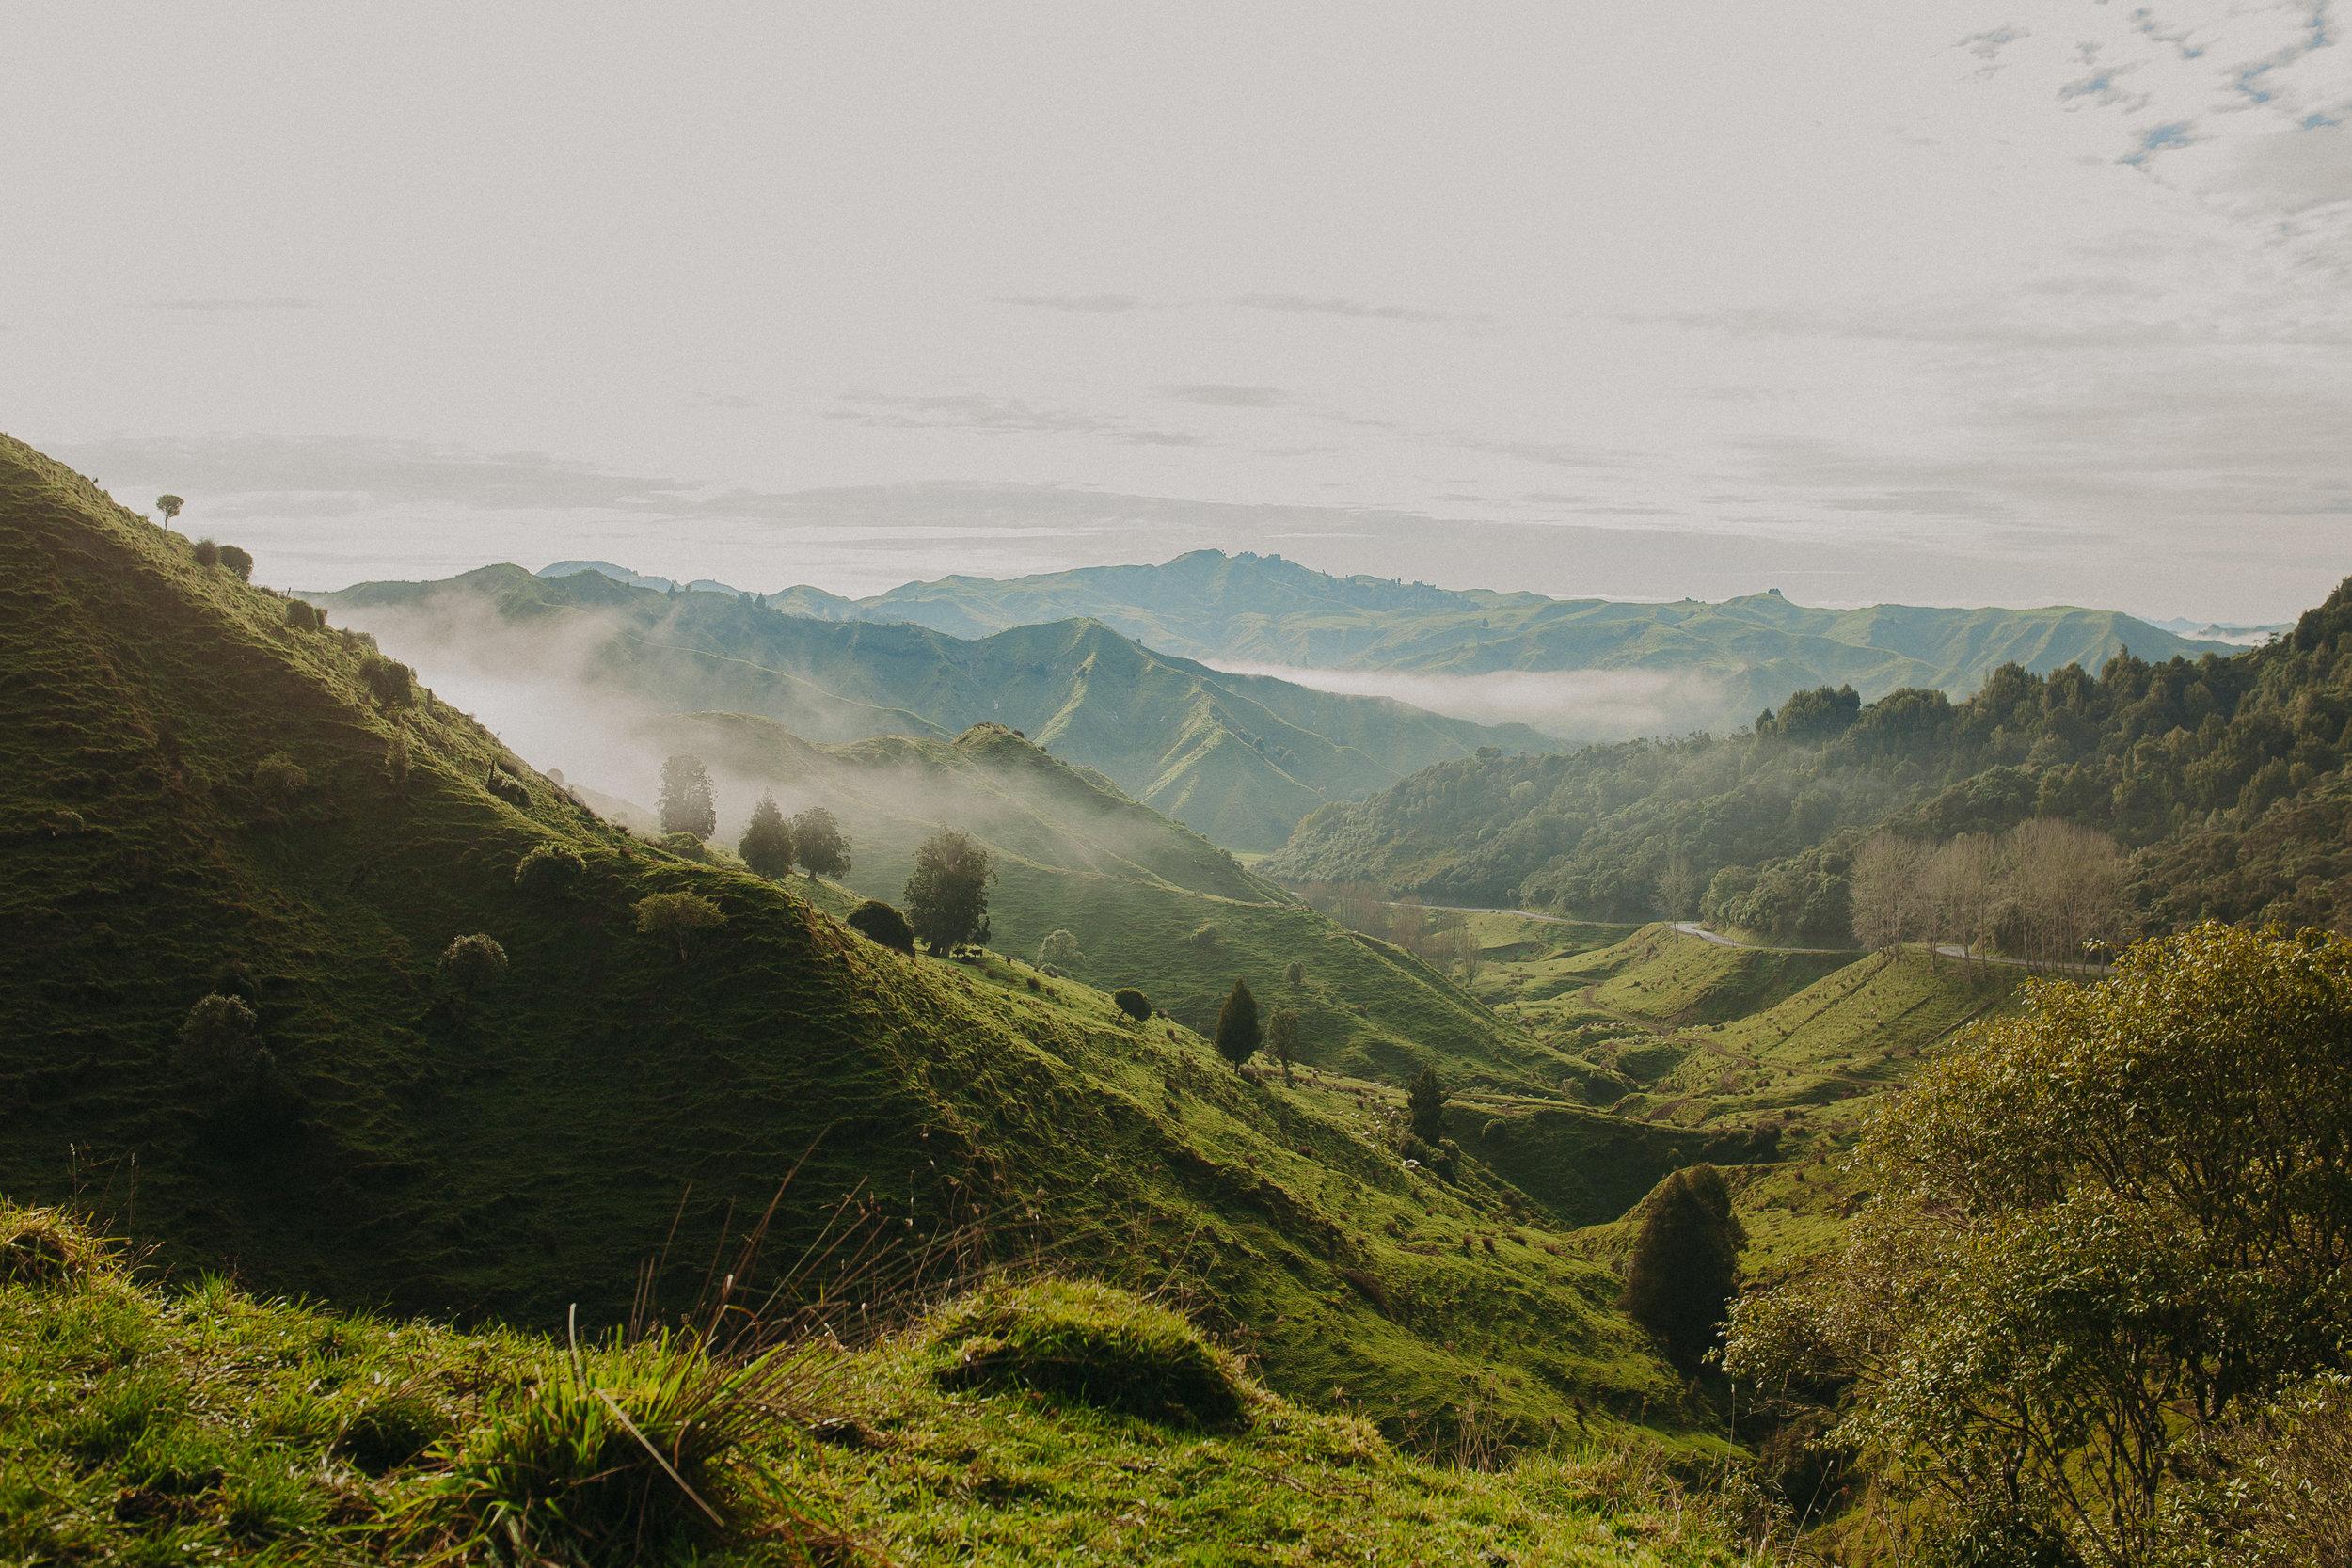 Forgotten-World-Highway-New-Zealand-10.jpg